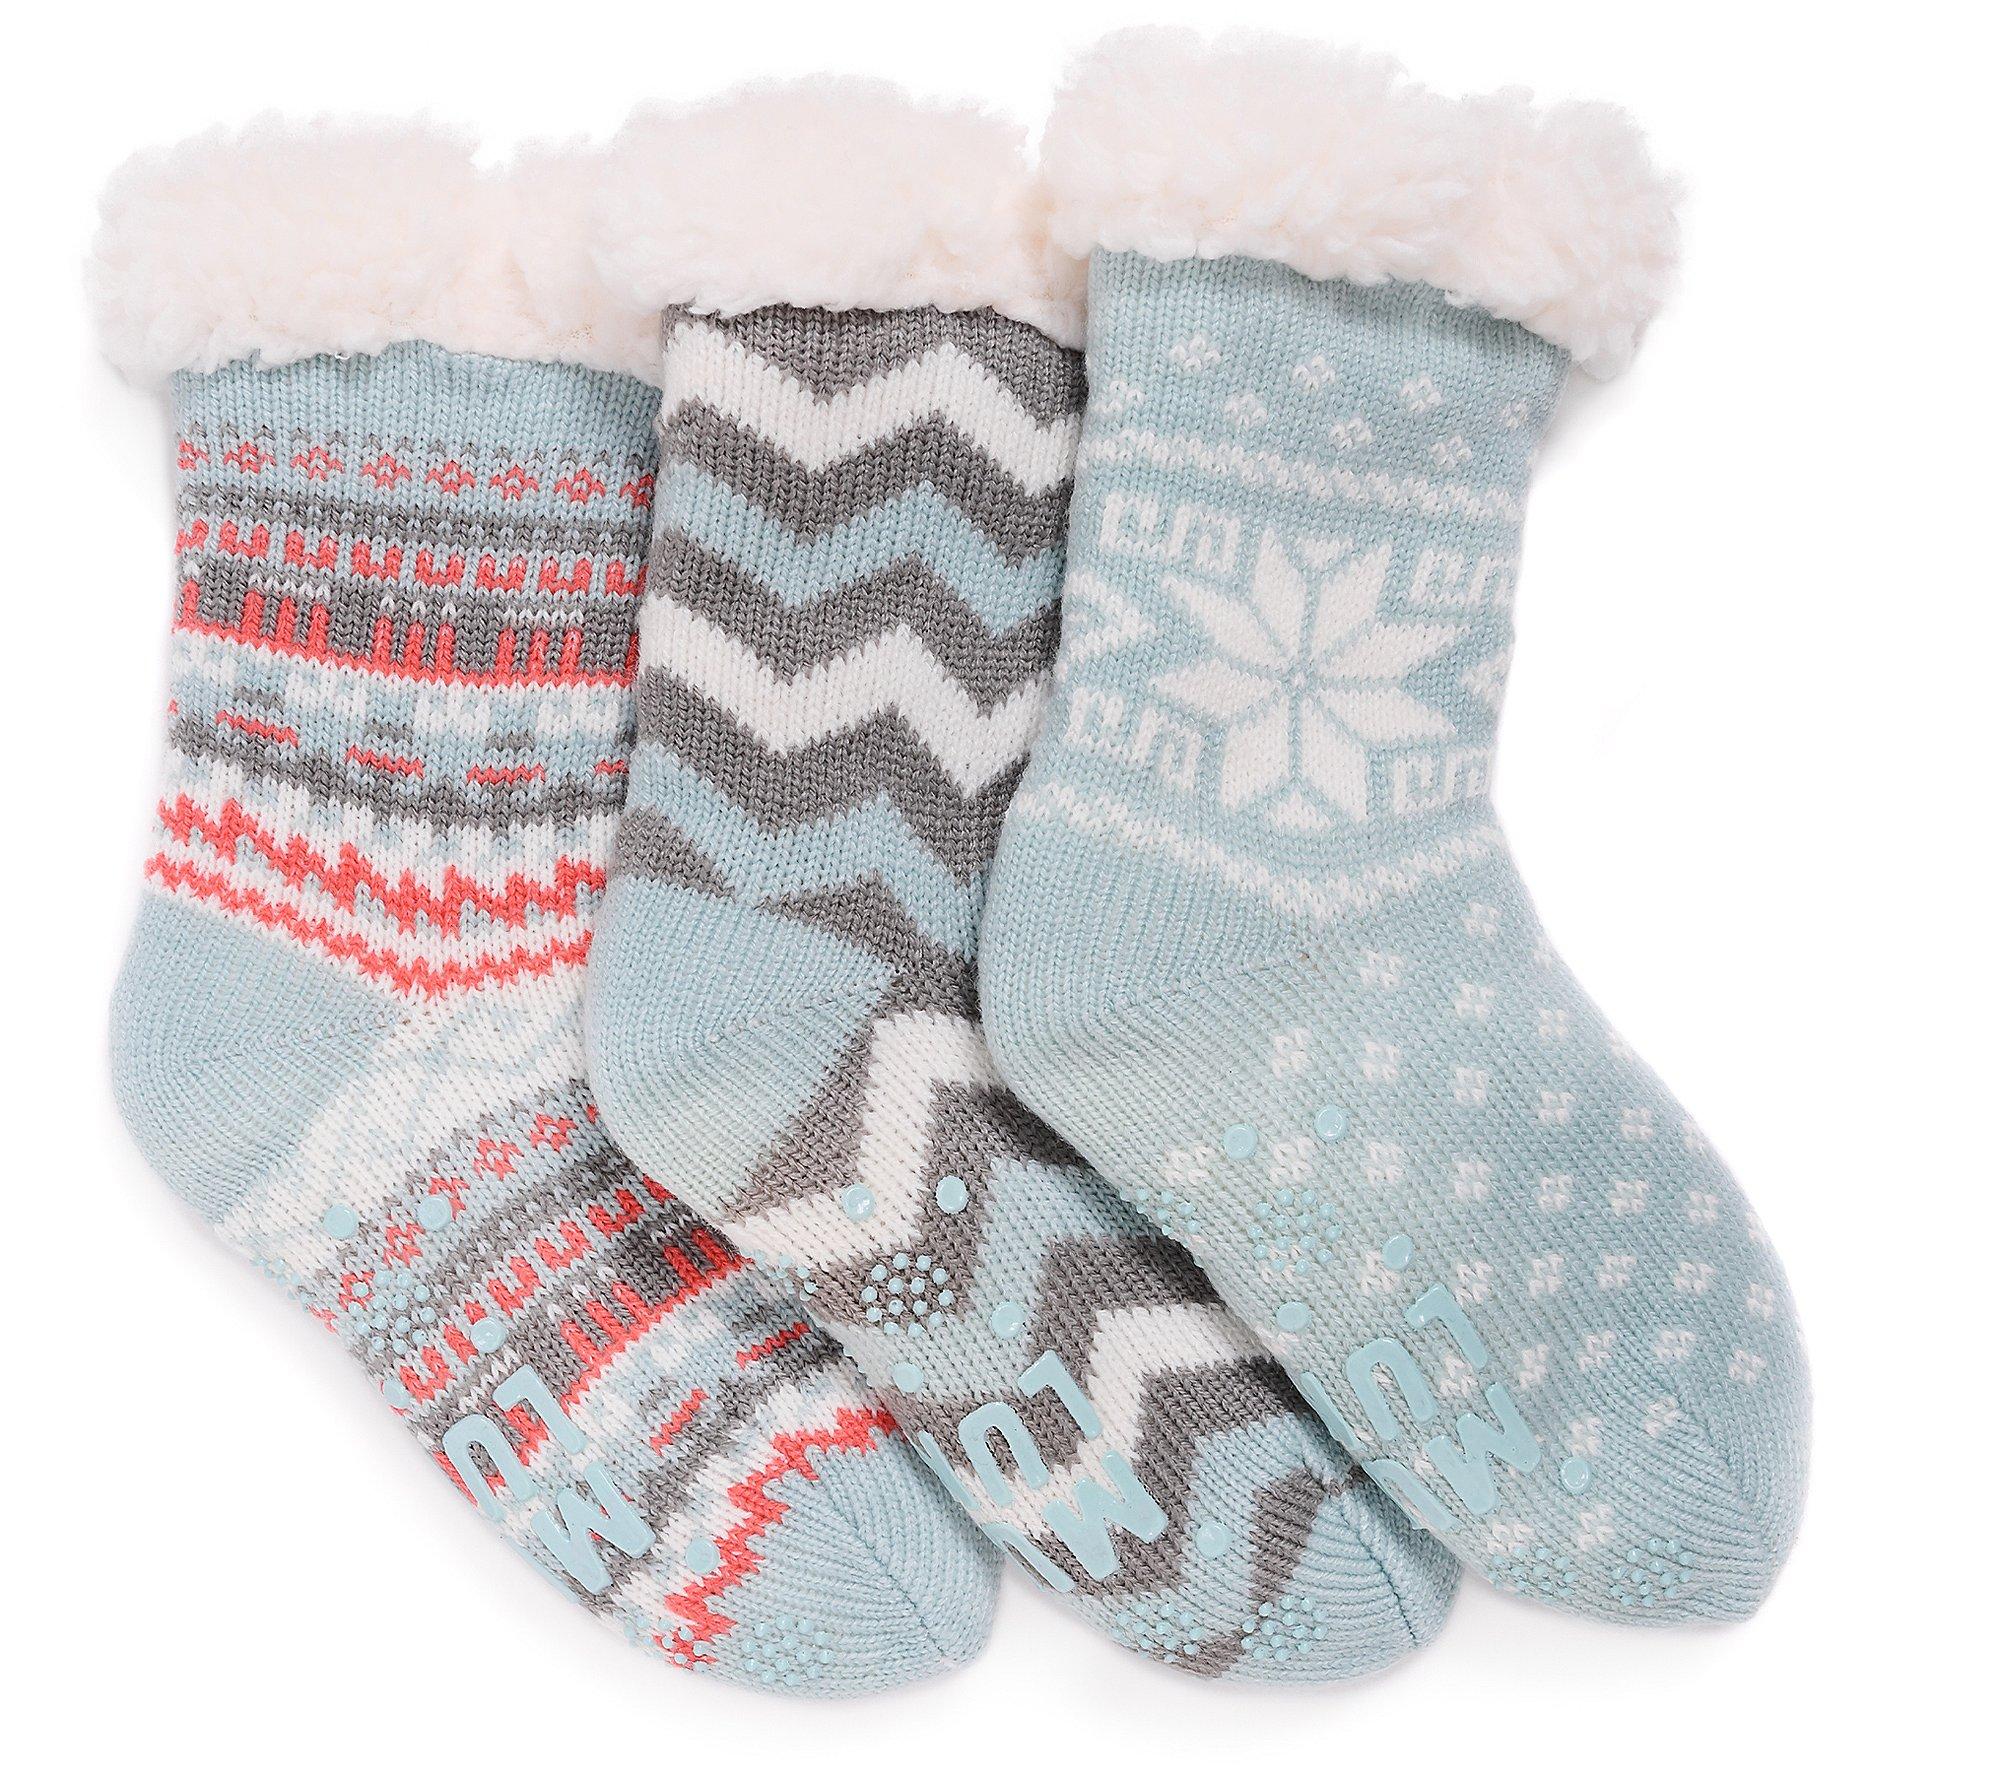 MUK LUKS Children's Jojoba Infused Cabin Socks Set of 3 - QVC.com